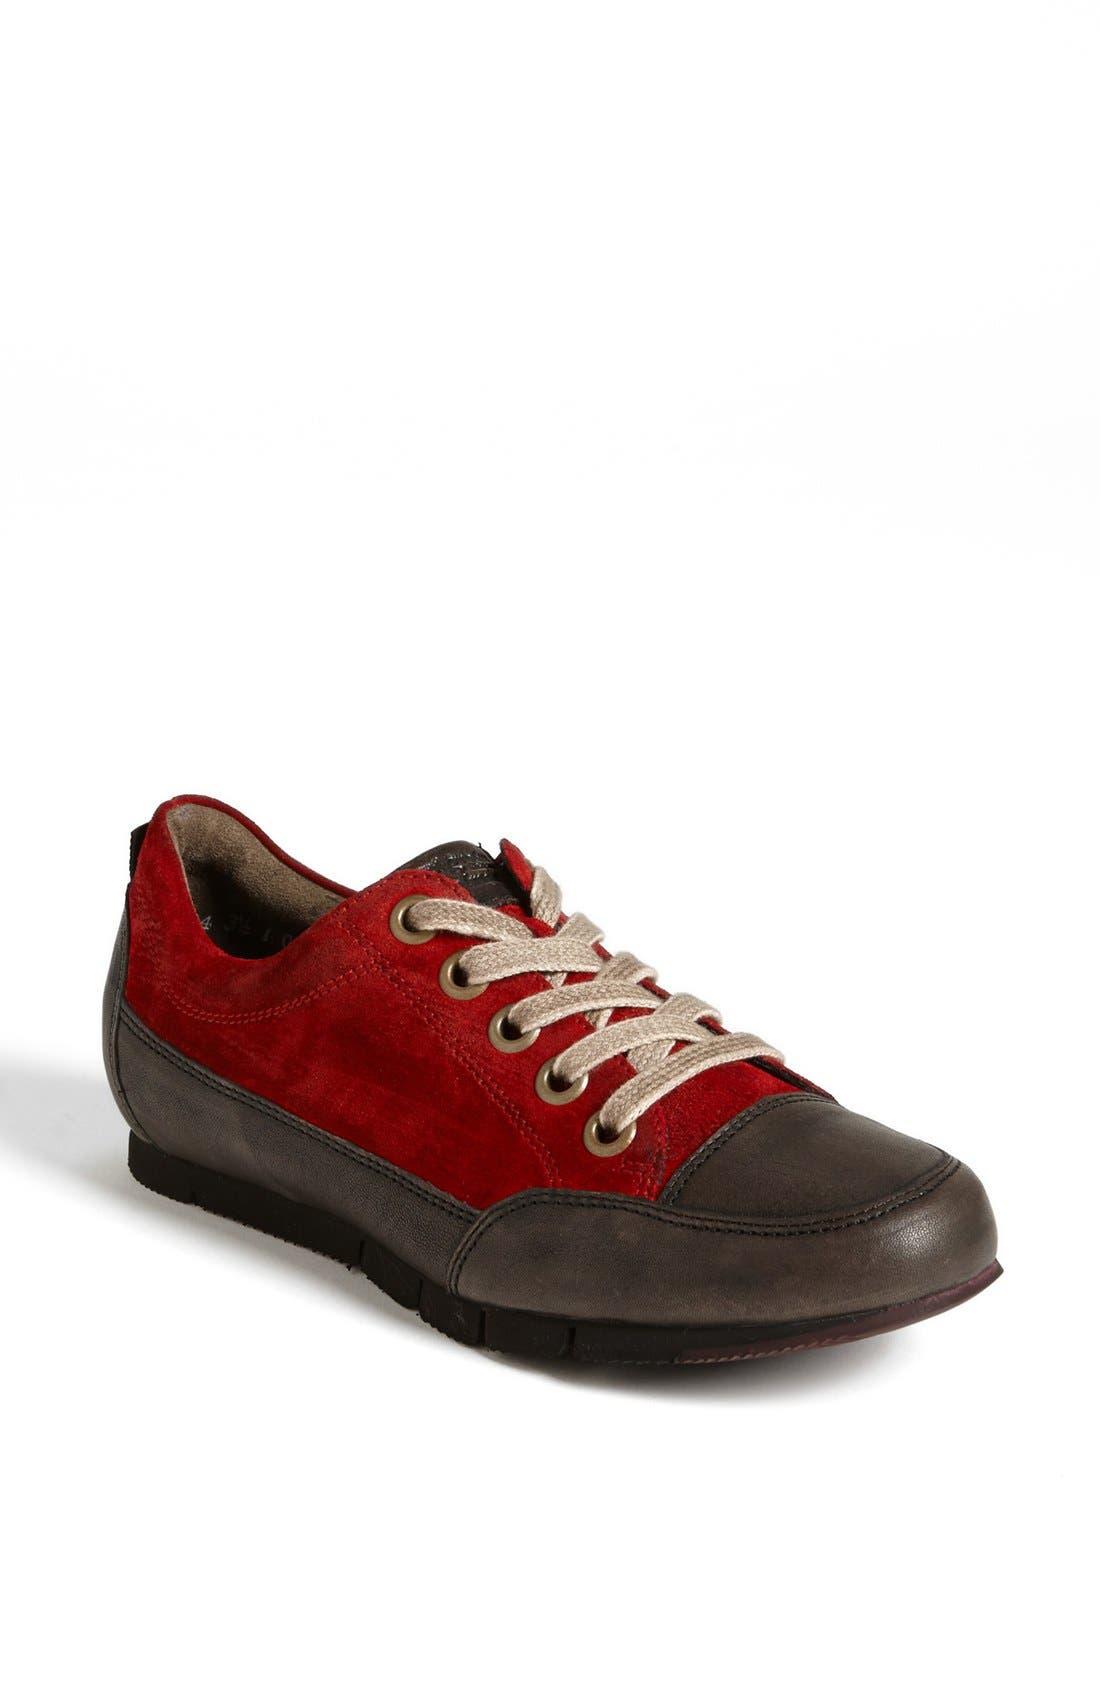 Main Image - Paul Green 'Posh' Sneaker